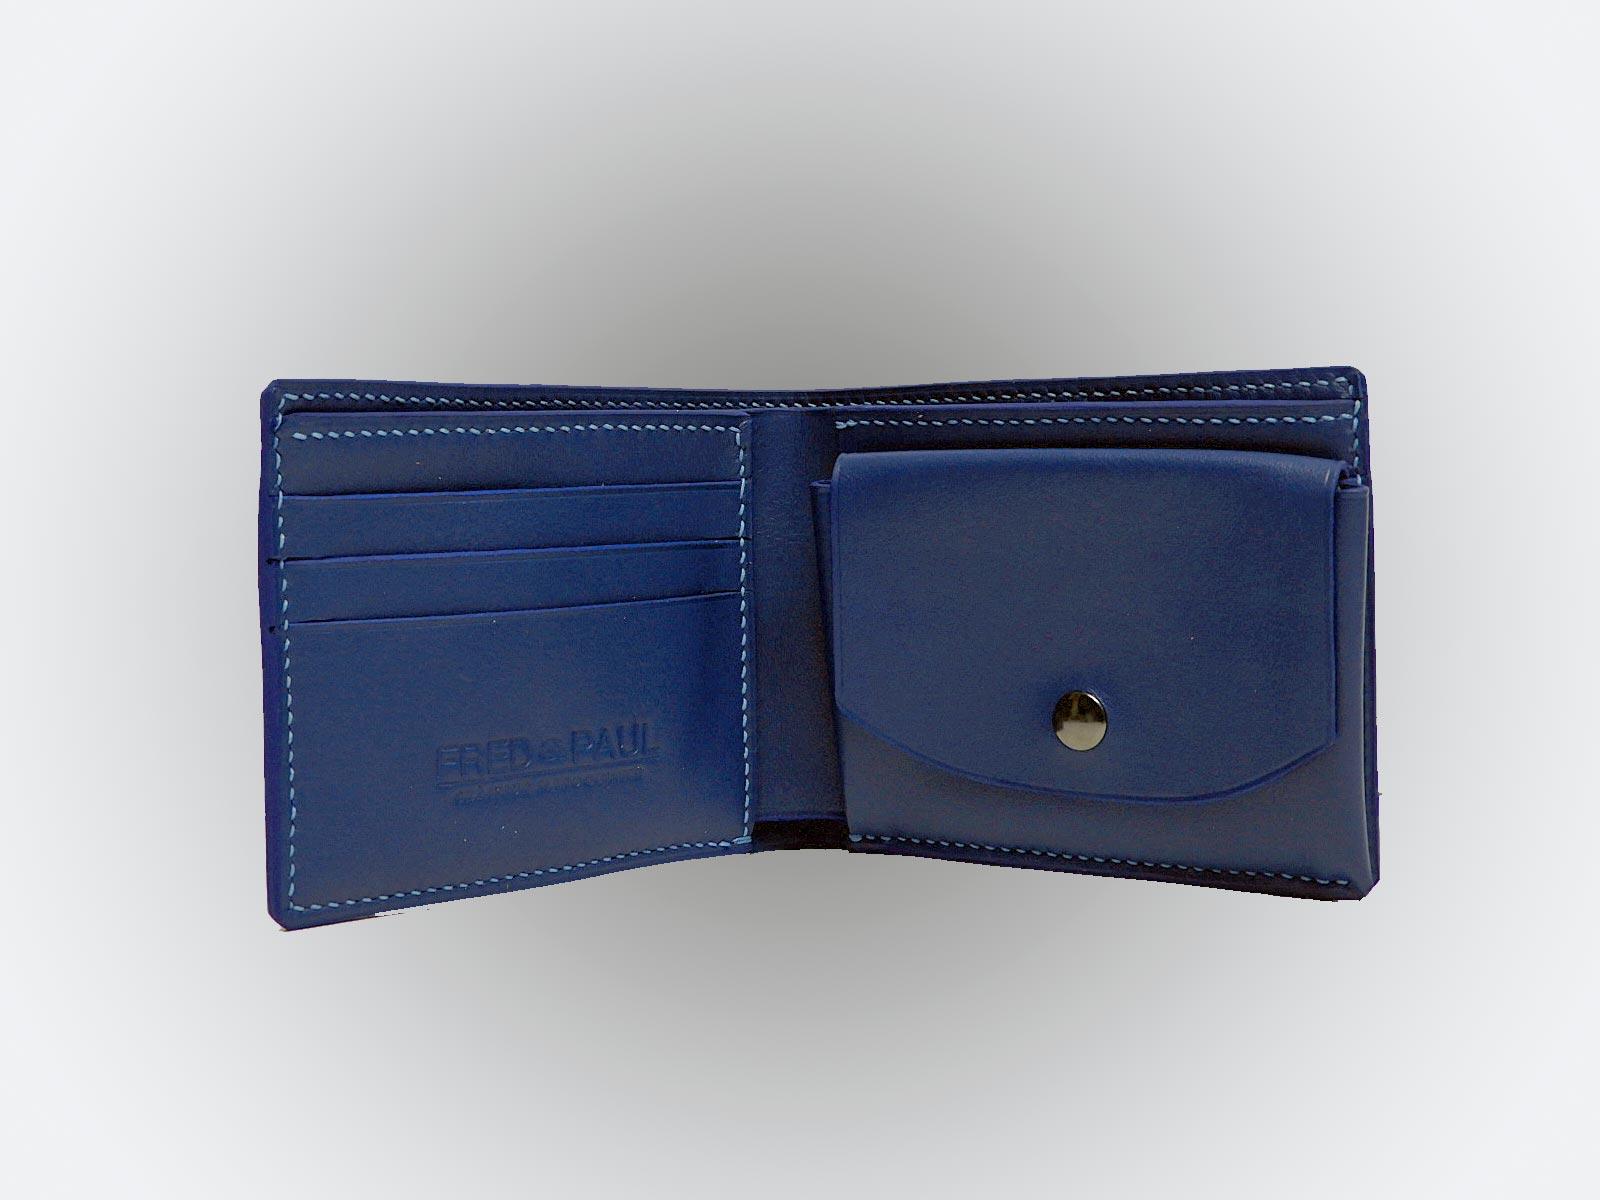 HONORIN, porte billets en cuir de veau bleu jean